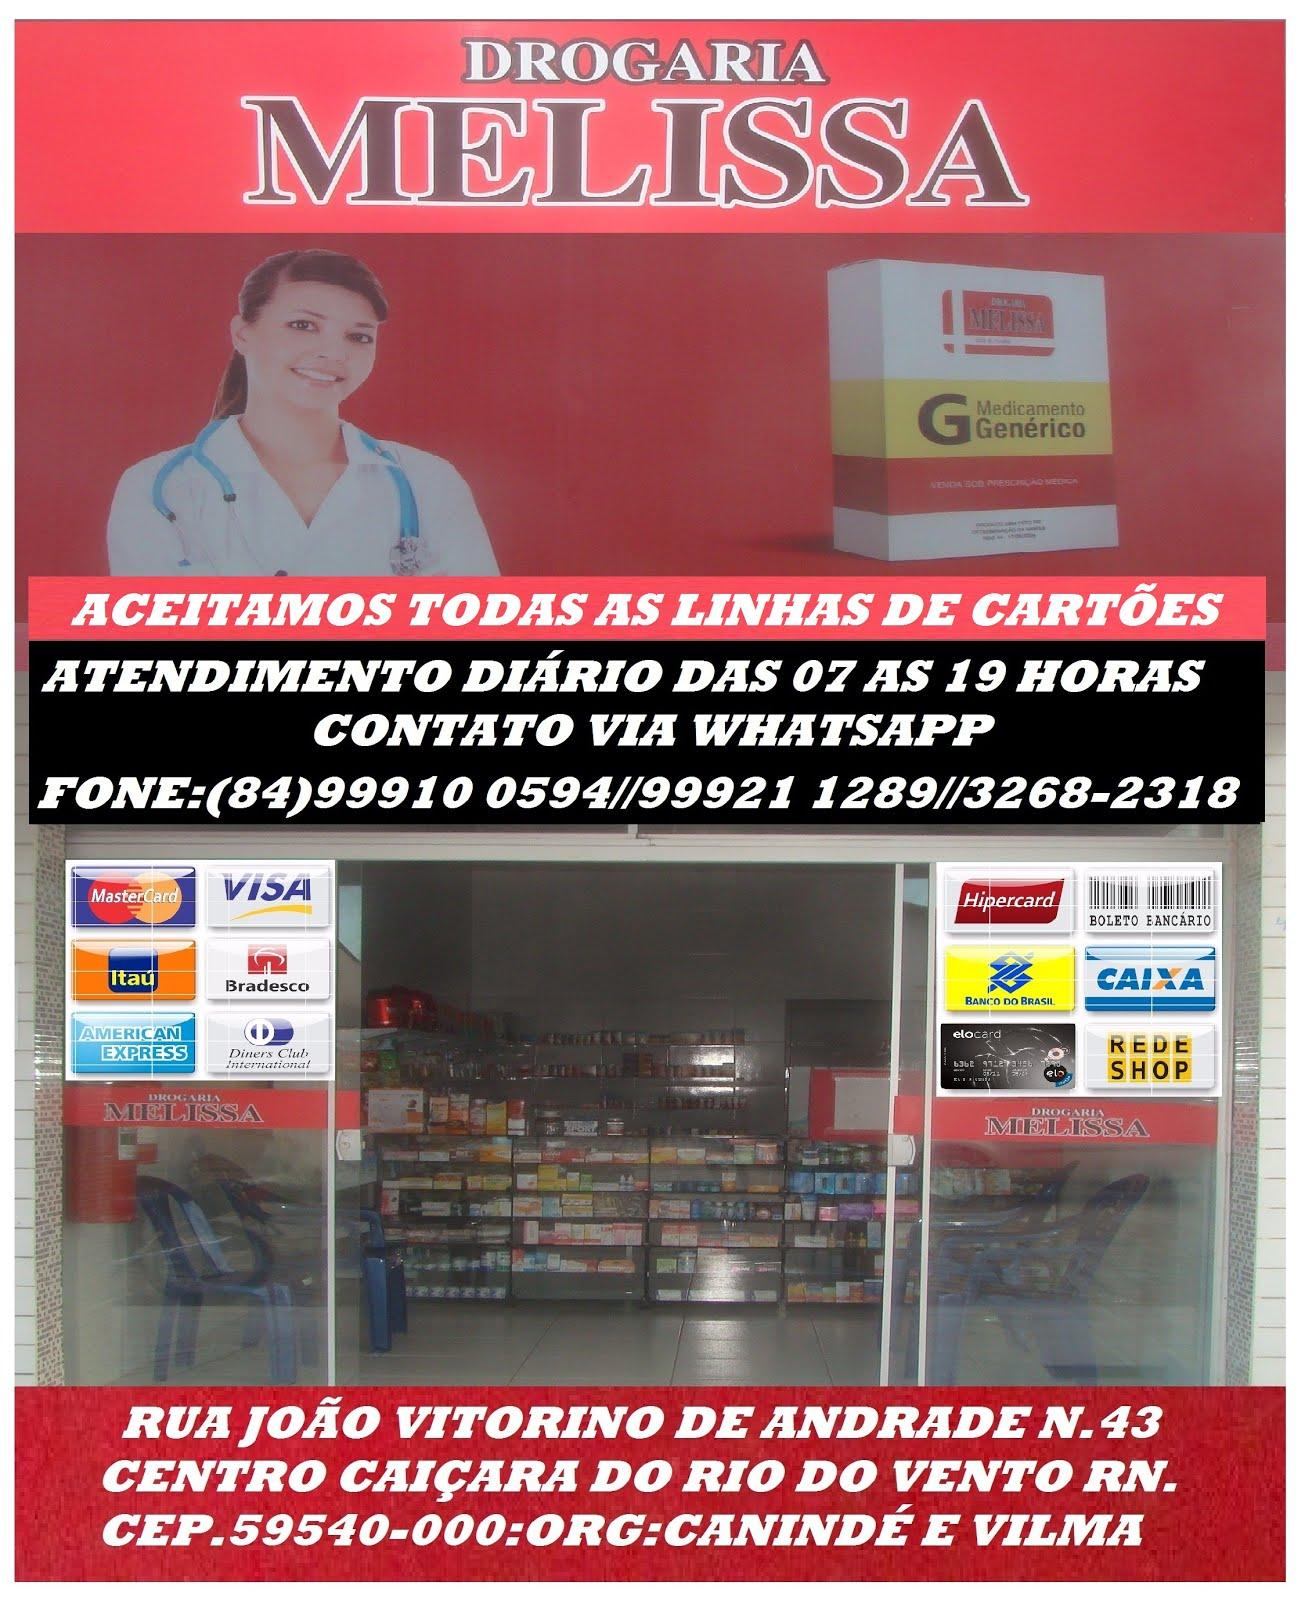 DROGARIA MELISSA CAIÇARA //RN